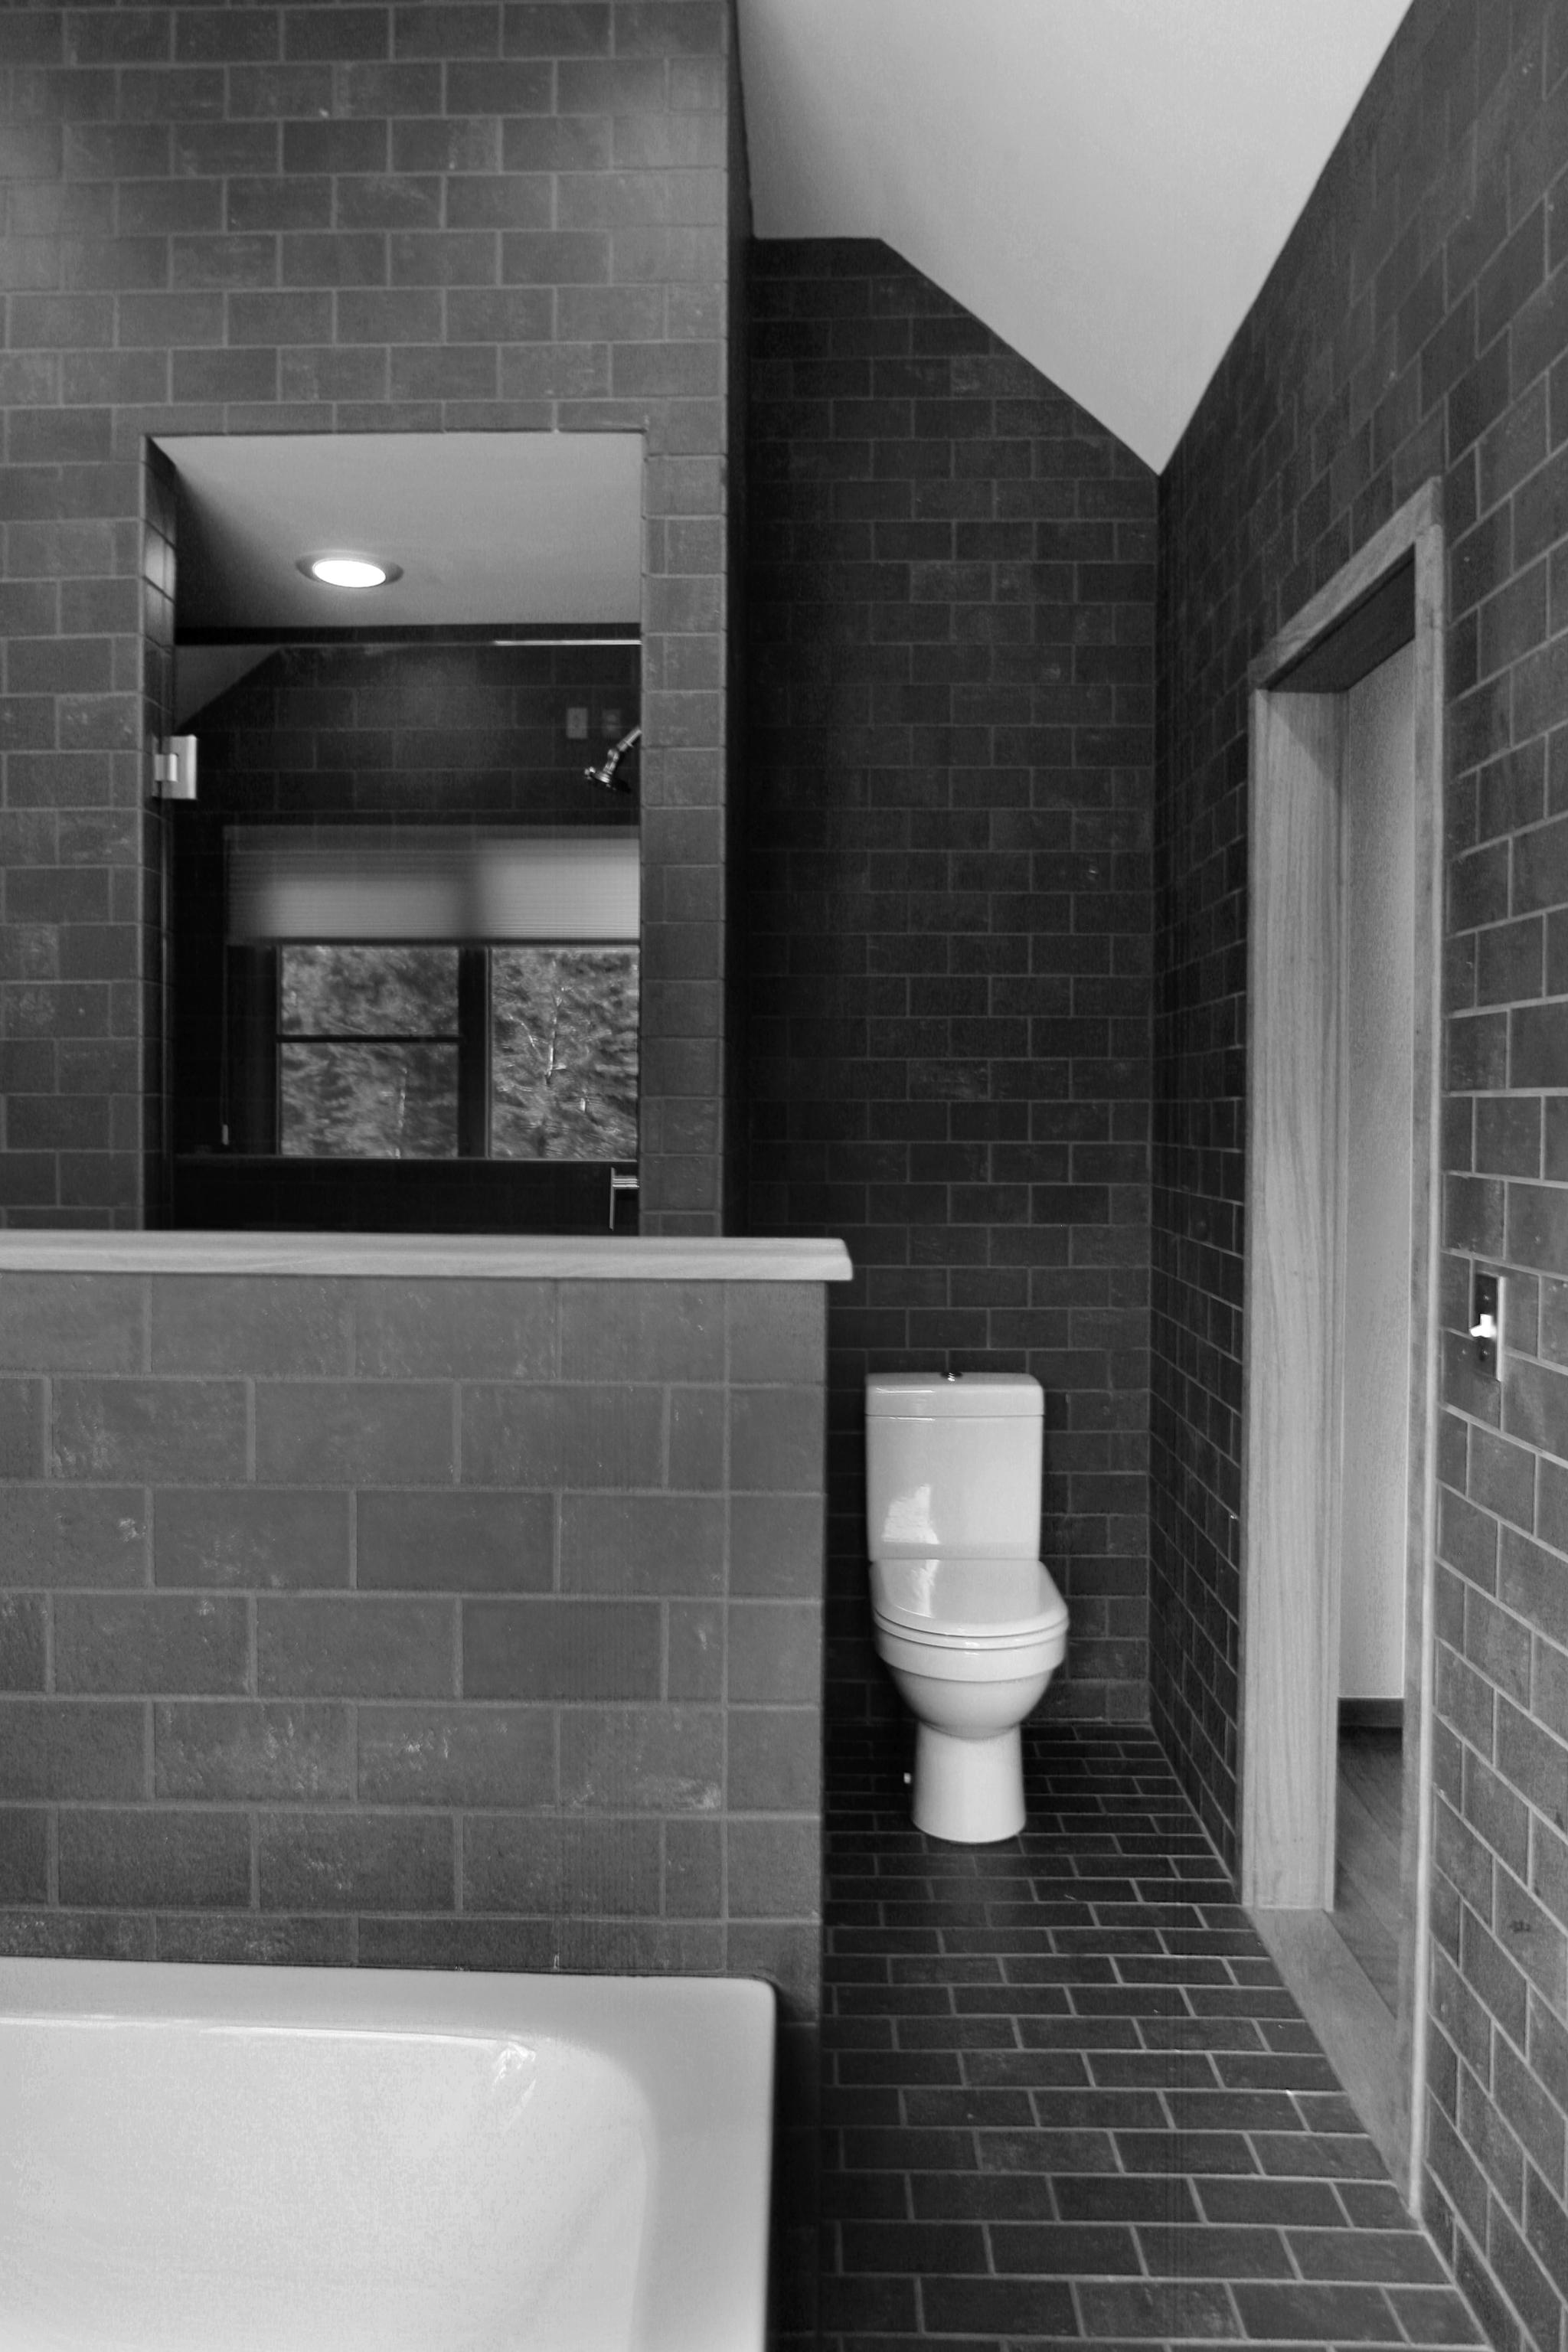 CARLSON CABANA BATH 2 - OOMBRA ARCHITECTS